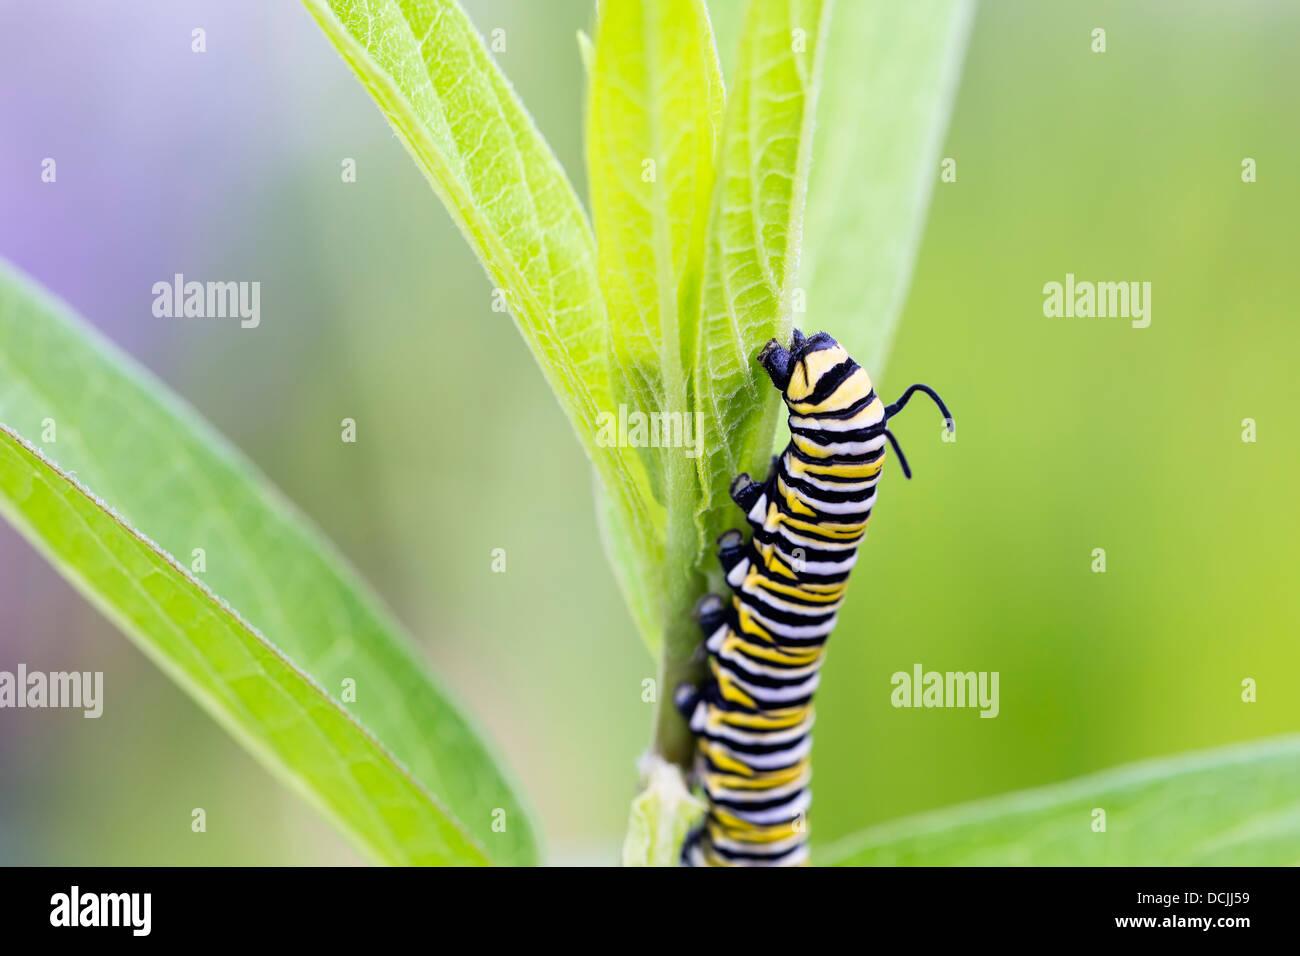 Monarch butterfly caterpillar (Danaus plexippus) on leaves - Stock Image